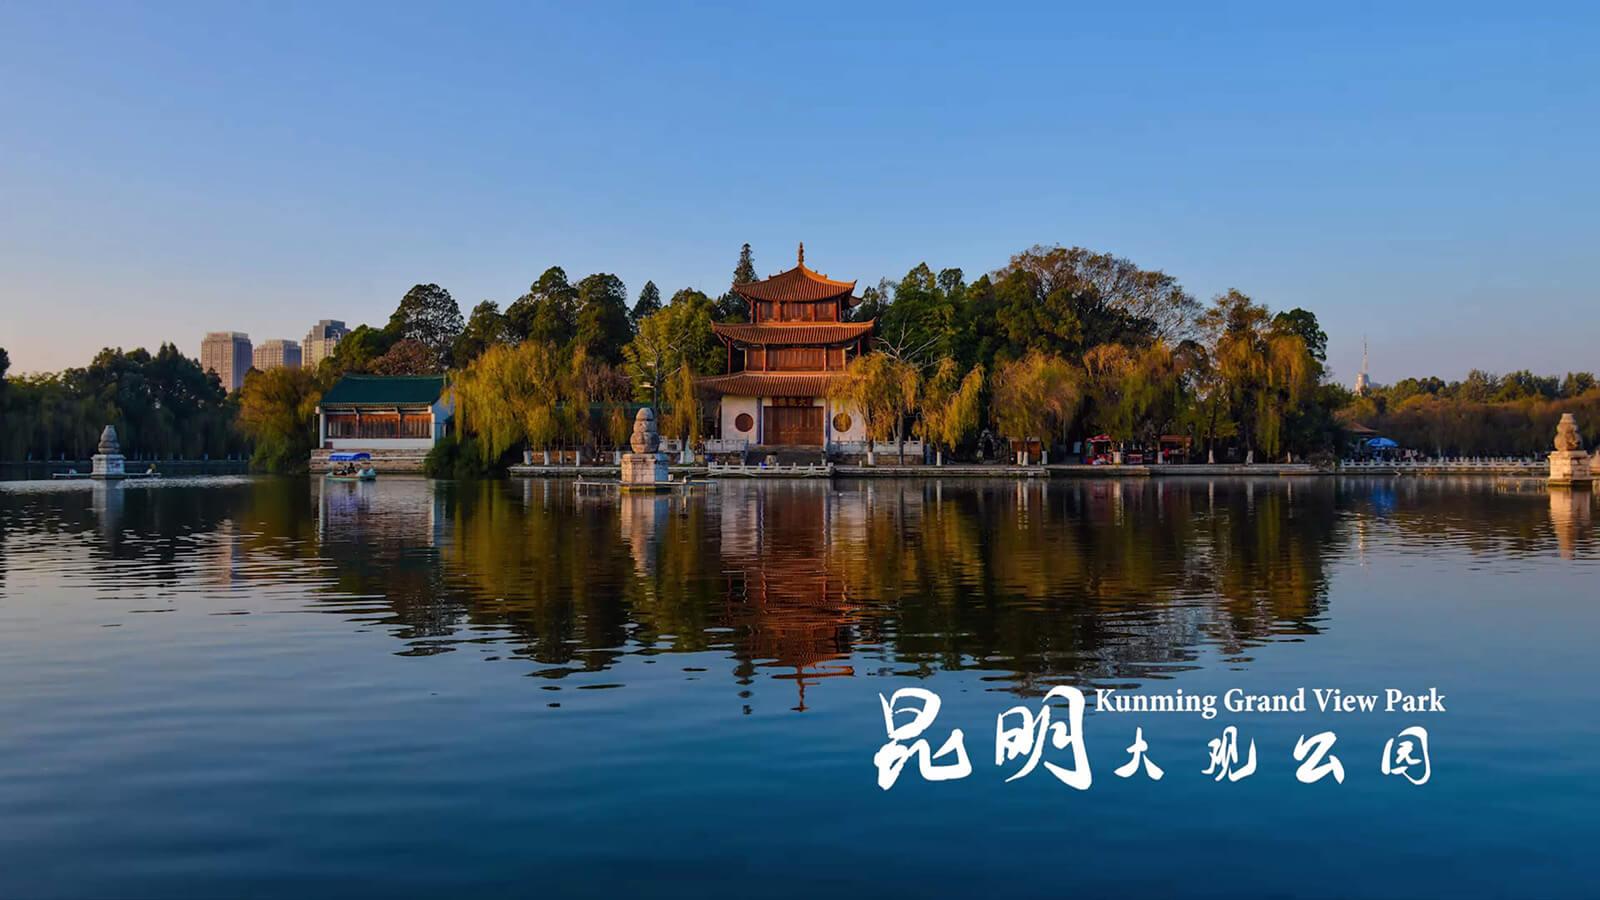 Kunming Grand View Park in colorful Yunnan, China